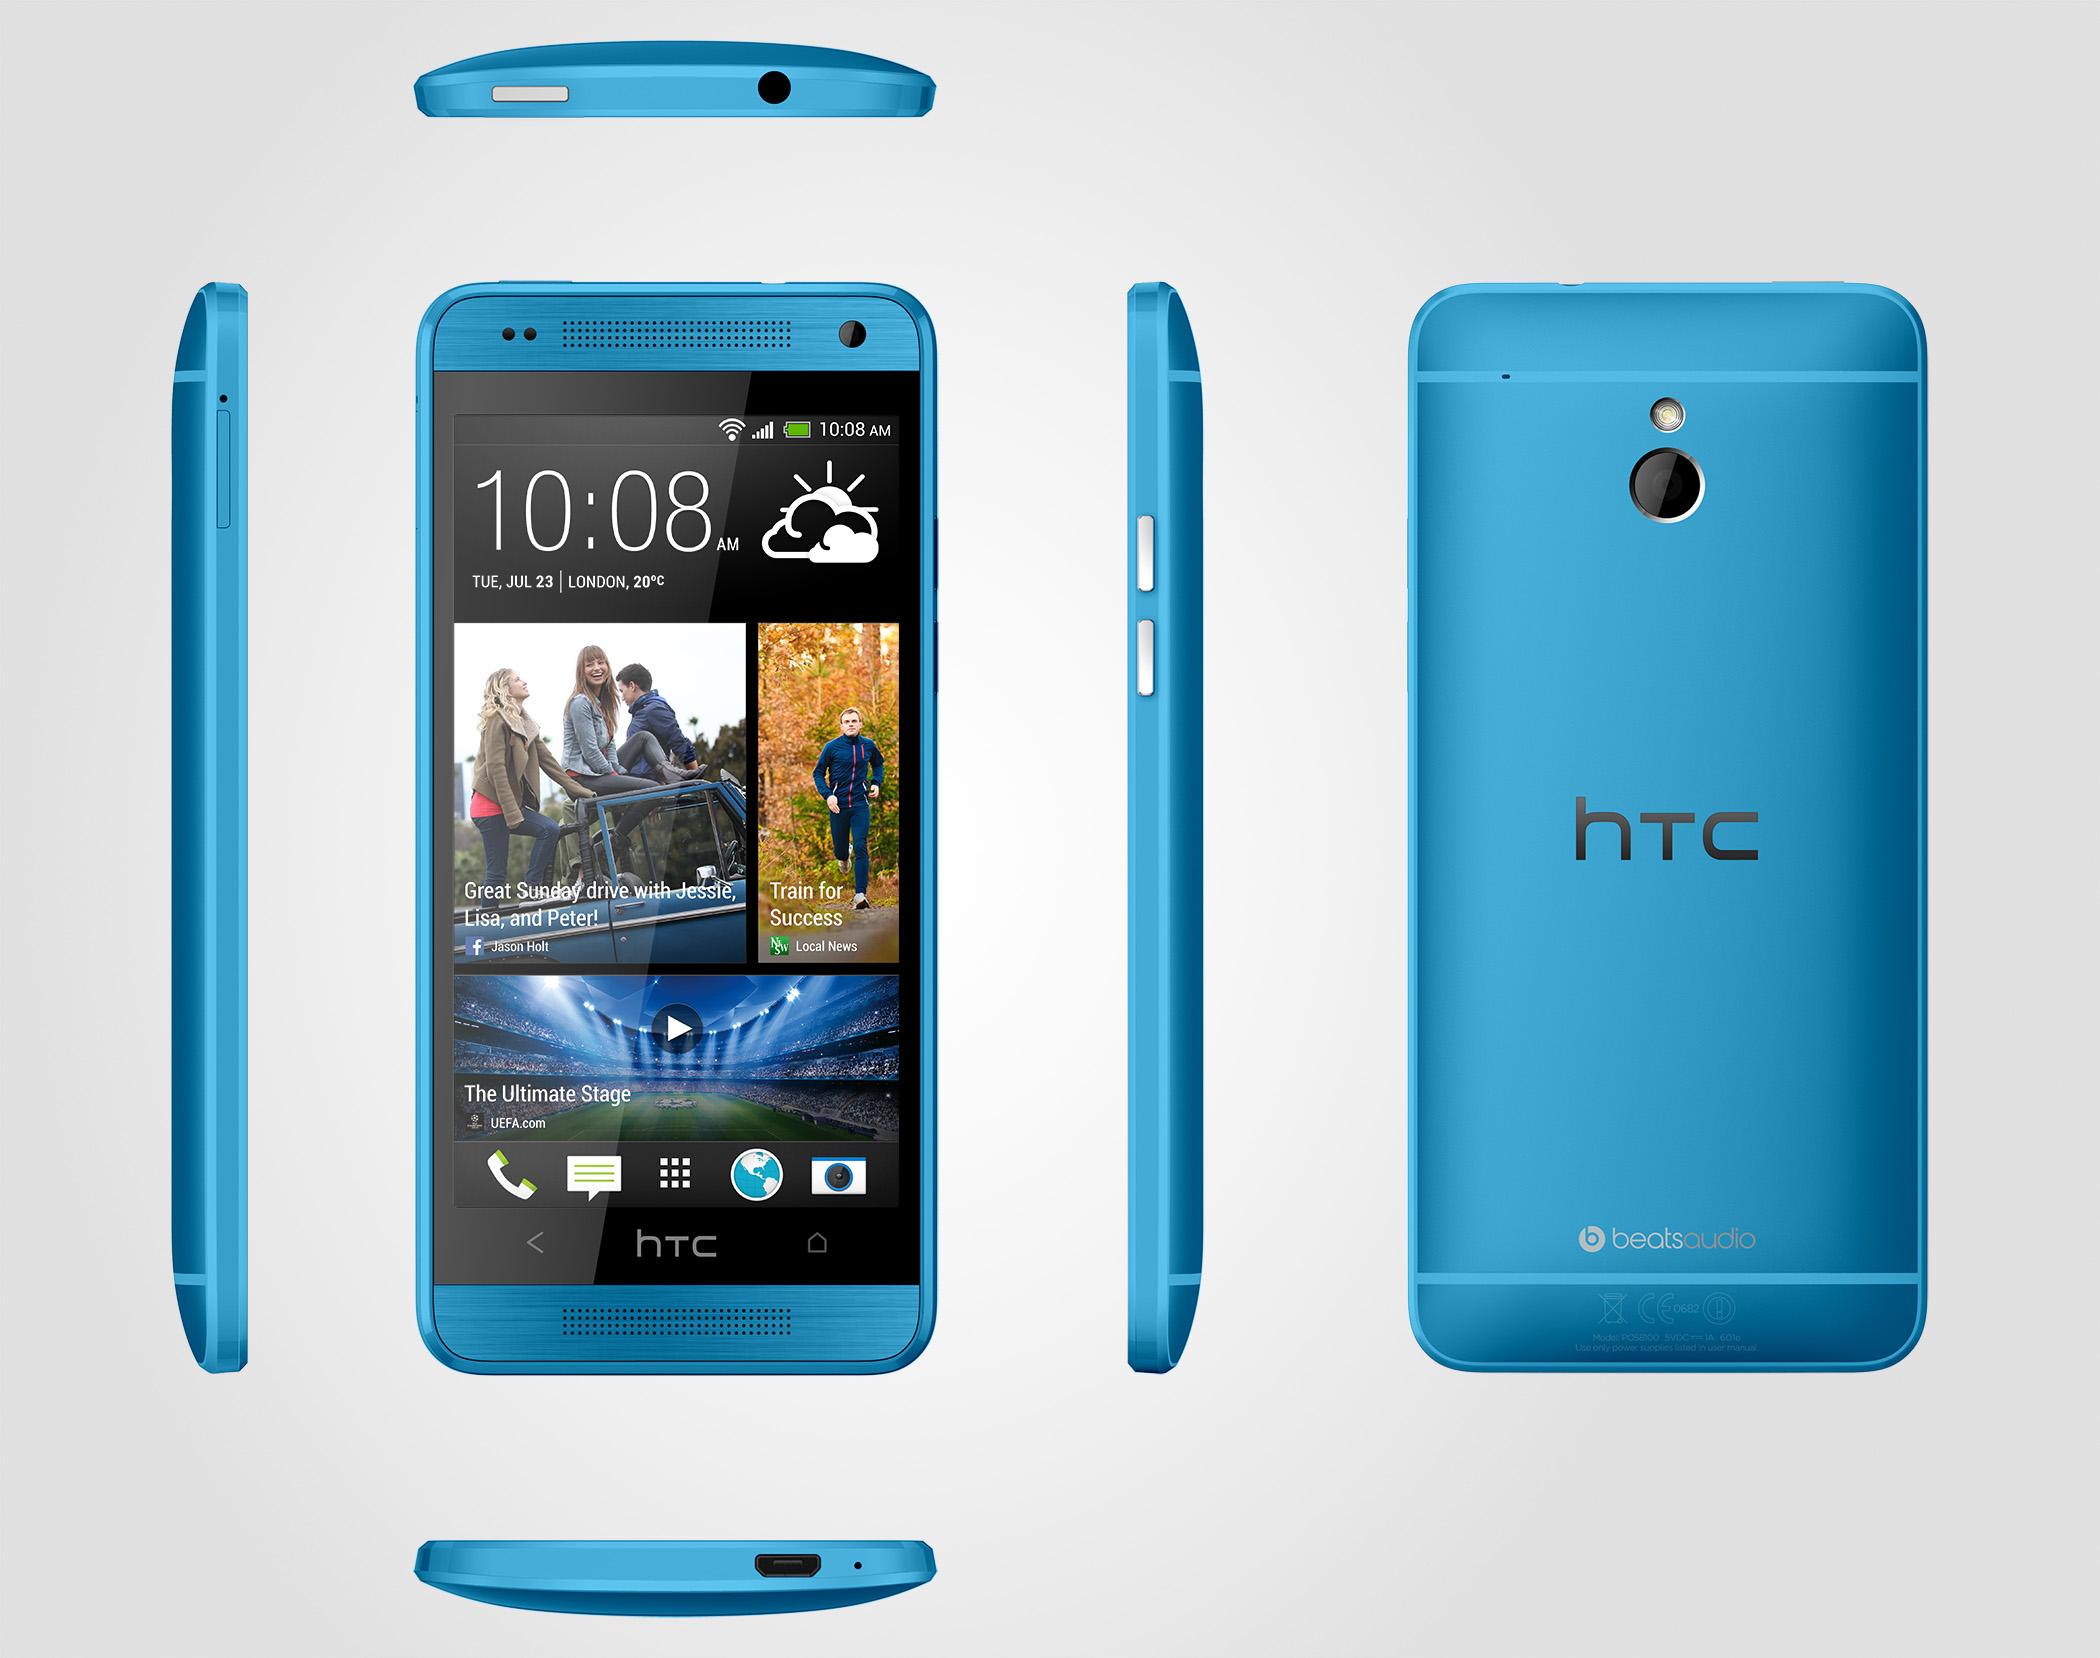 HTC One mini en color azul vívido Vivid Blue